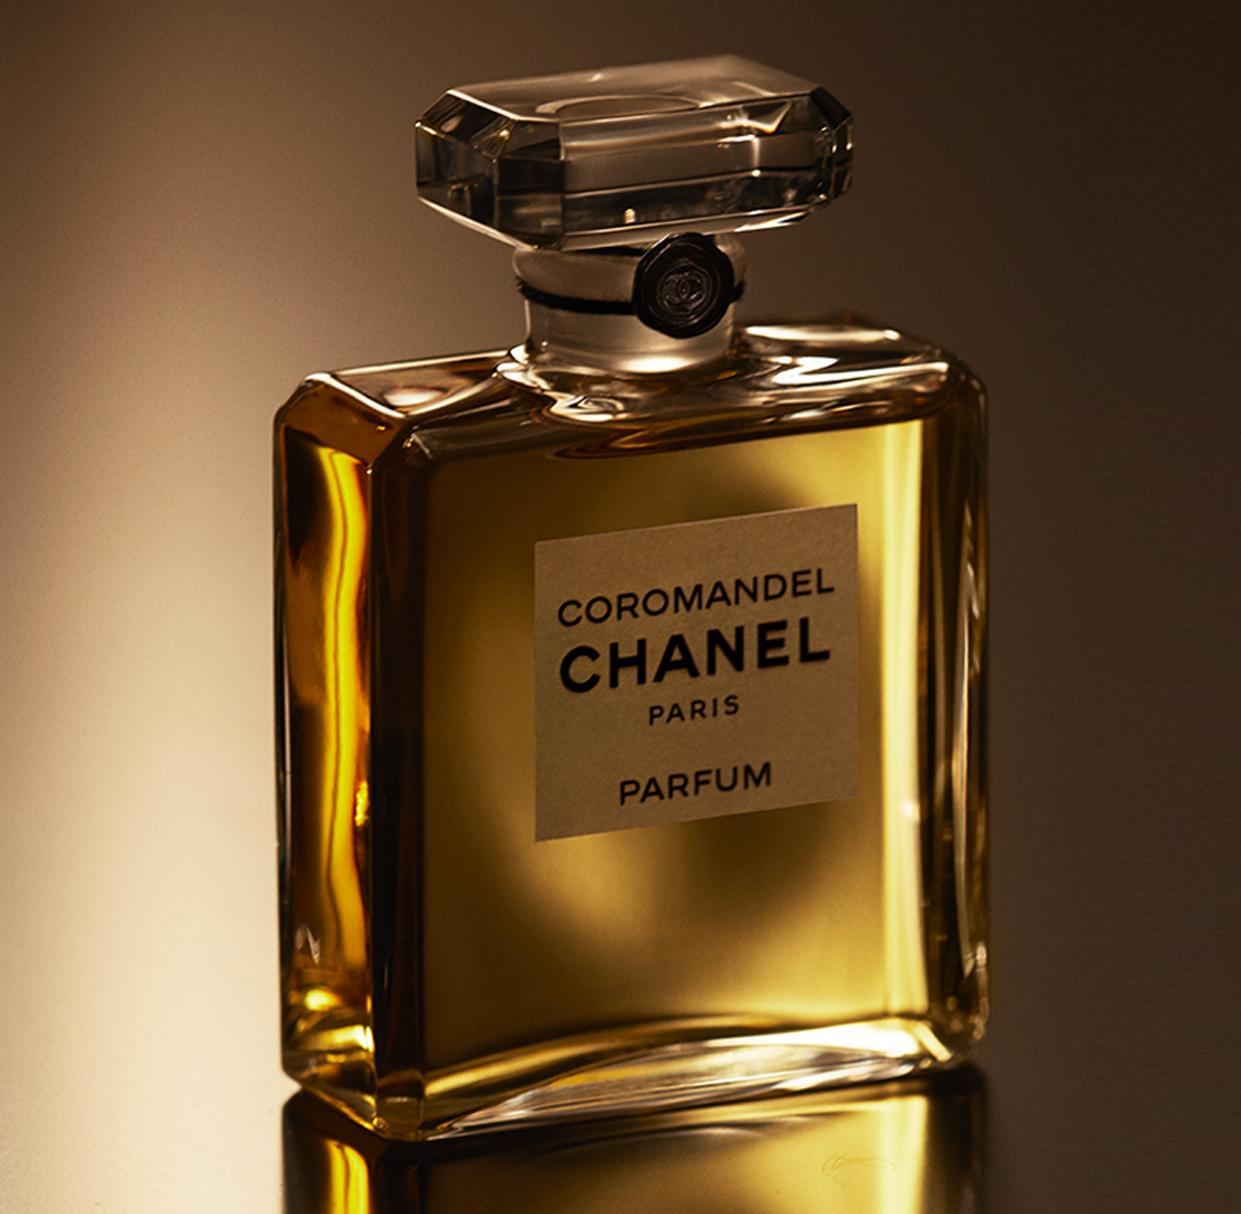 Coromandel Chanel Paris